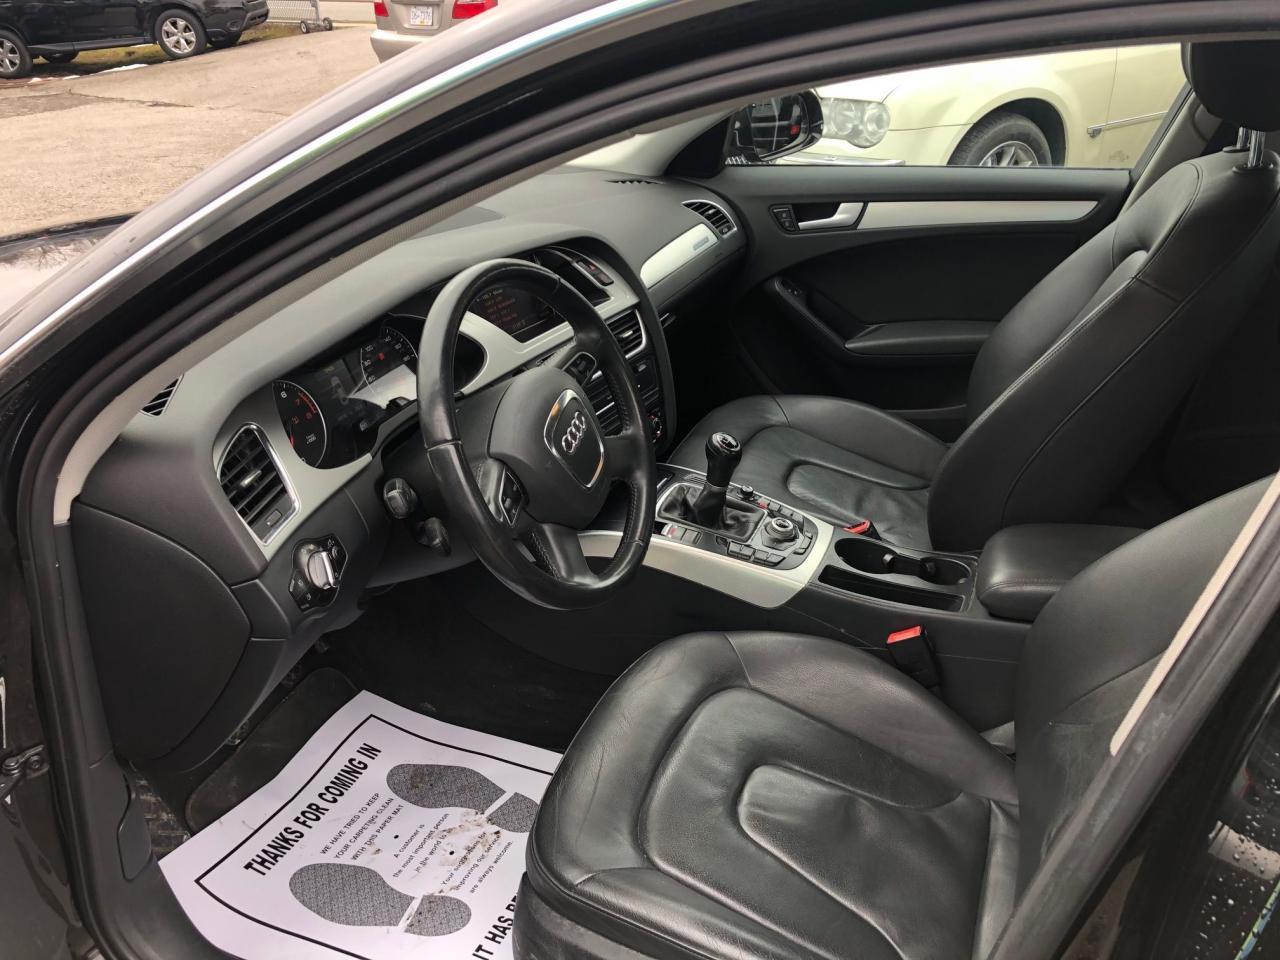 2010 Audi A4 QUATTRO SPORT